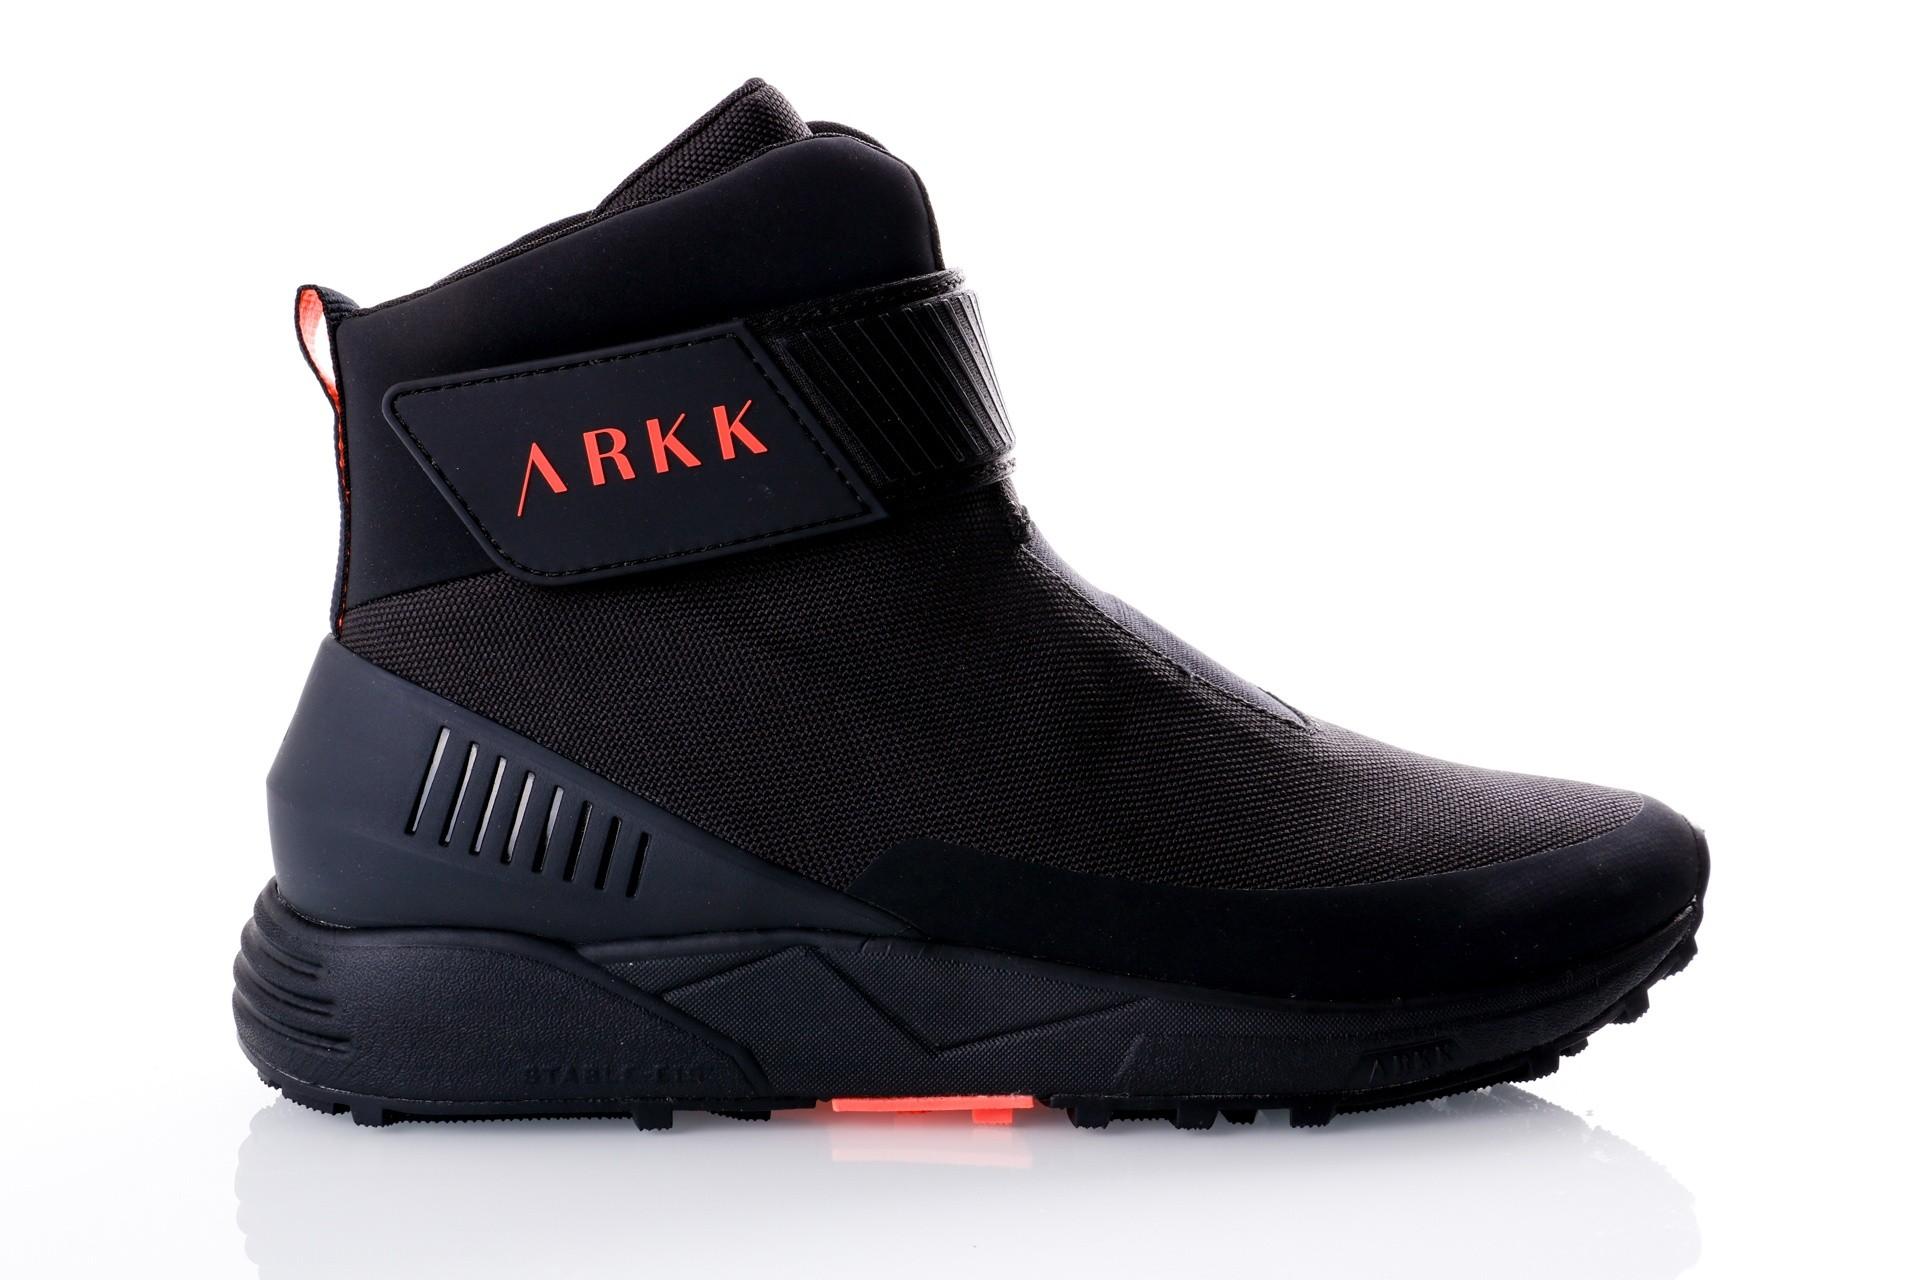 Foto van Arkk Chrontech Mesh HS W13 Black Neon Coral-M ML2600-9908-M Sneakers Black